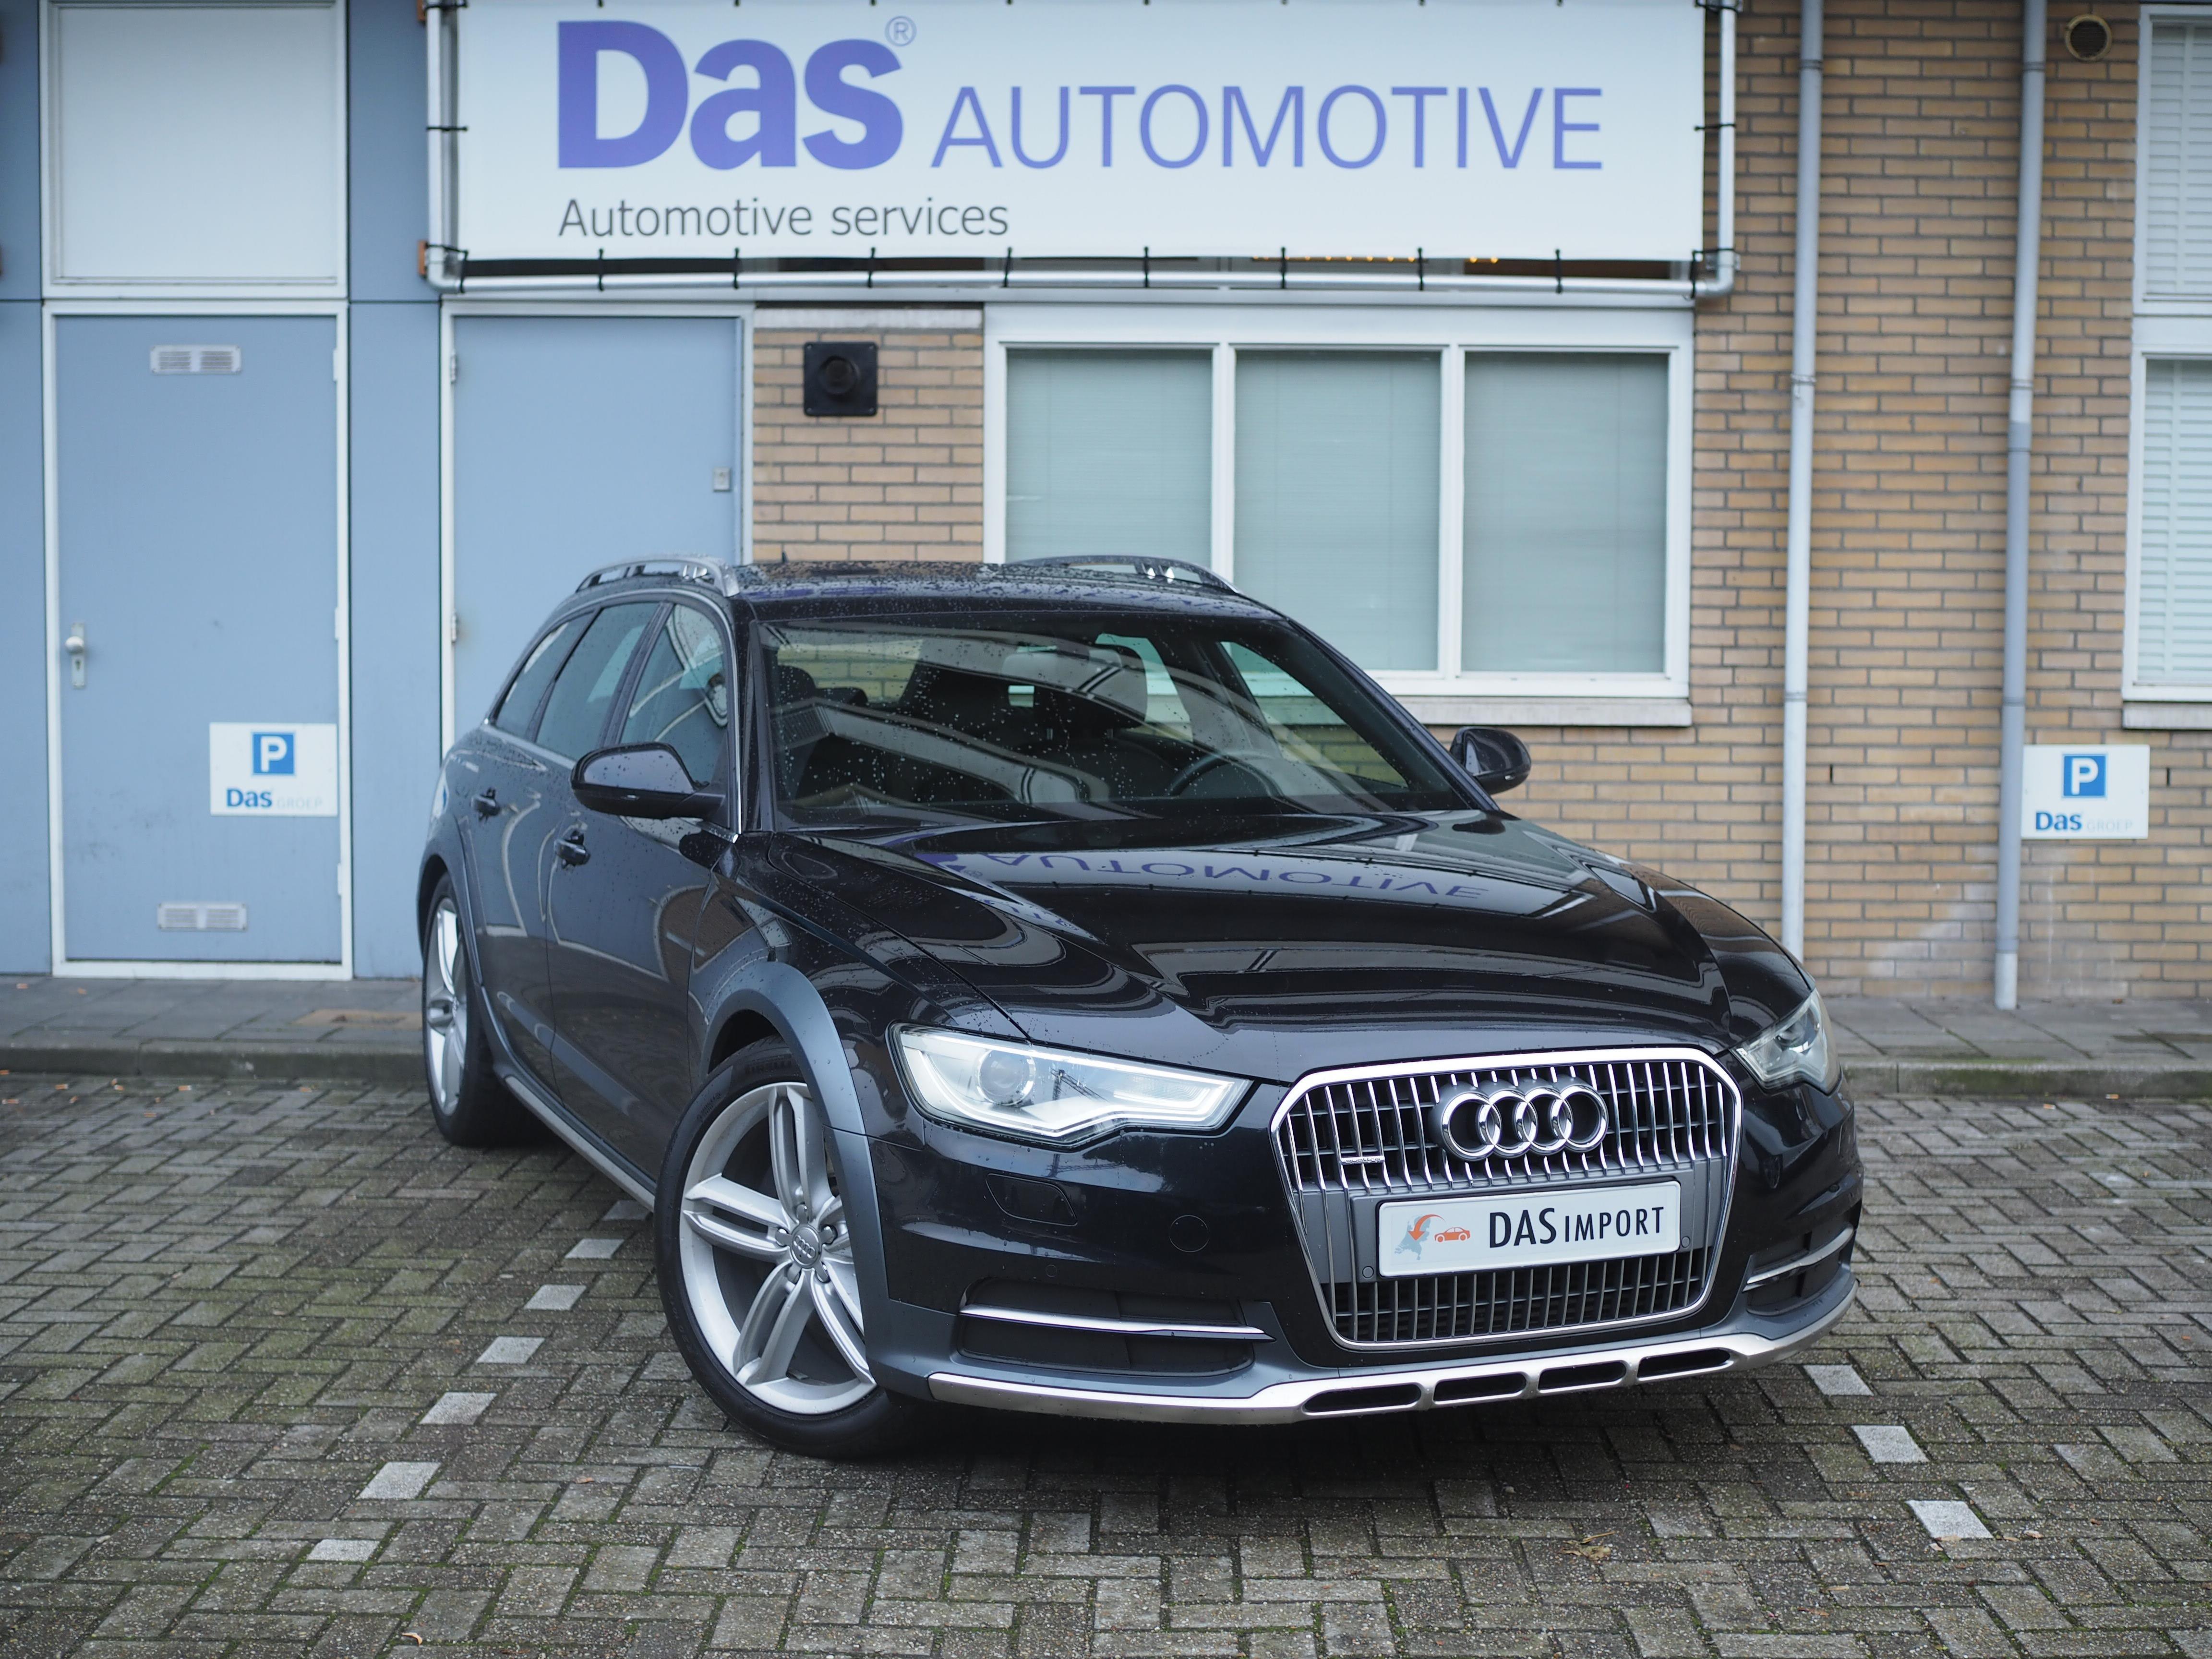 Importauto: Audi A6 Allroad Diesel 3.0 TDI 180kW quattro S tronic 7/2012